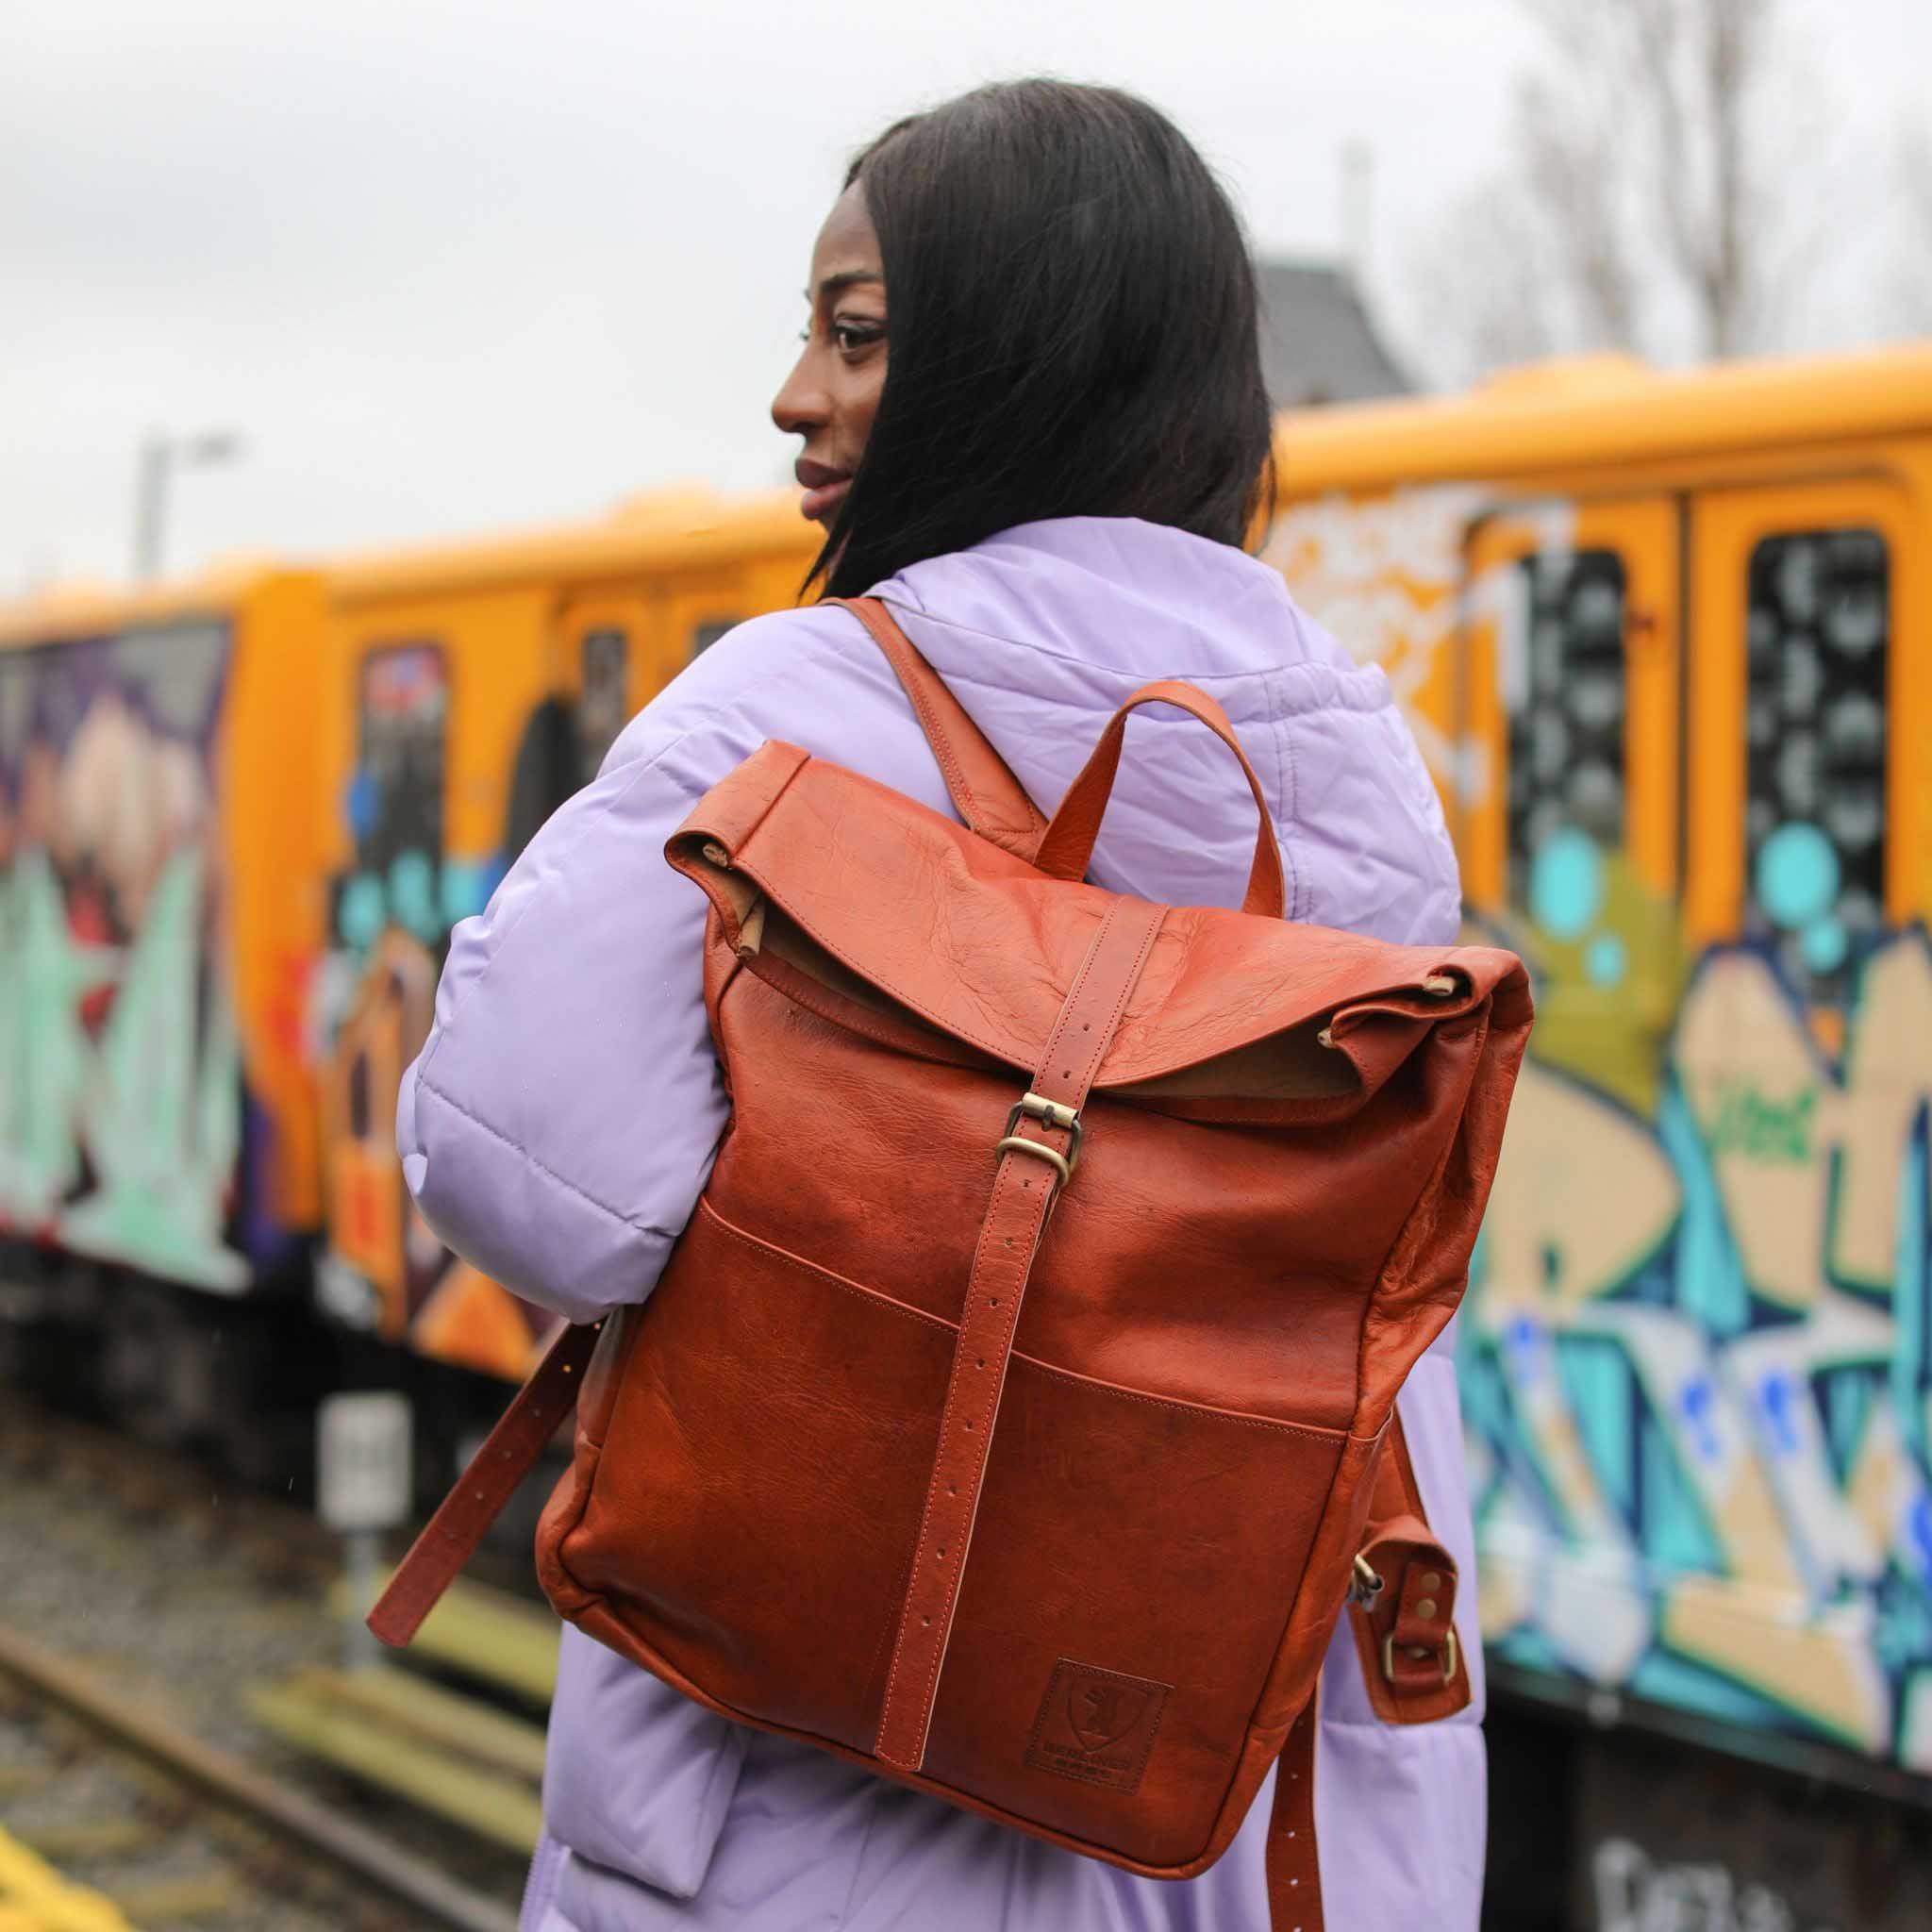 Berliner Bags Berlin Paris Rucksack Leather Backpack Vintage Brown Leder Men Women Minimalist Style Taschen Fahrradrucksack Lederrucksack